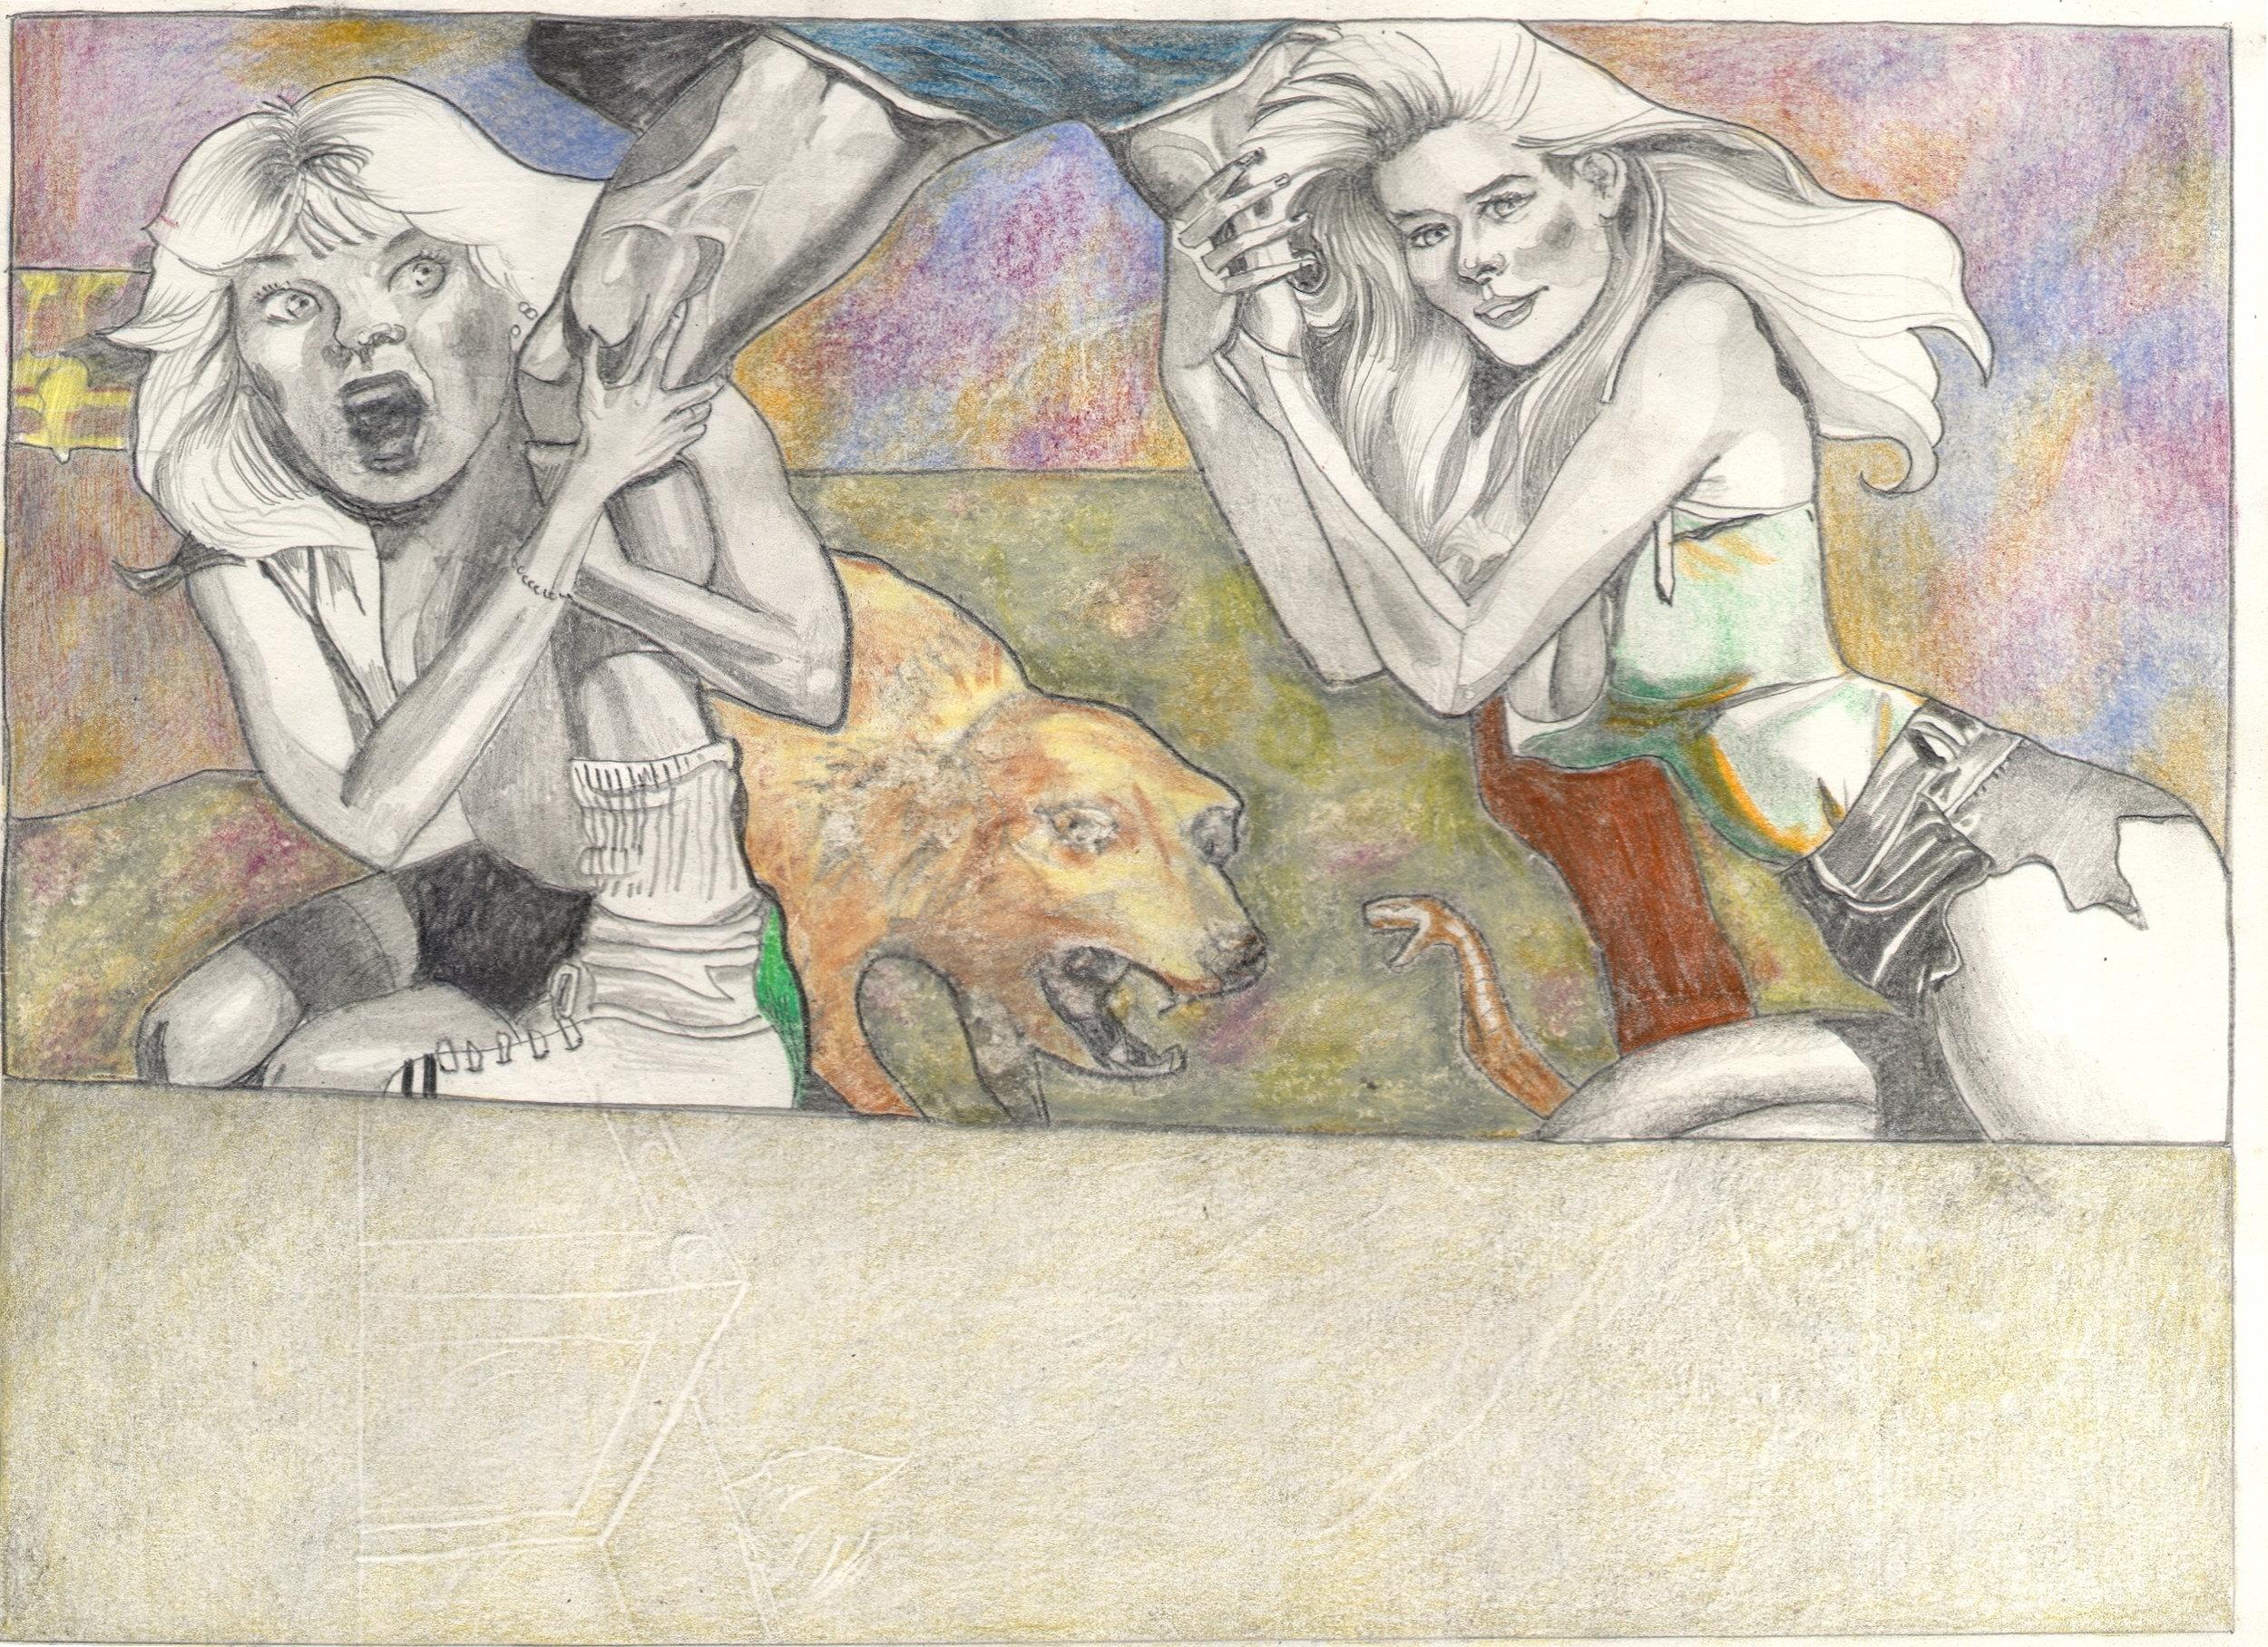 O.T. ( Serie Fantasy VI Boris Vallejo Paraphrase ), 2018  Bleistift Buntstift auf Papier, 26x35.5cm